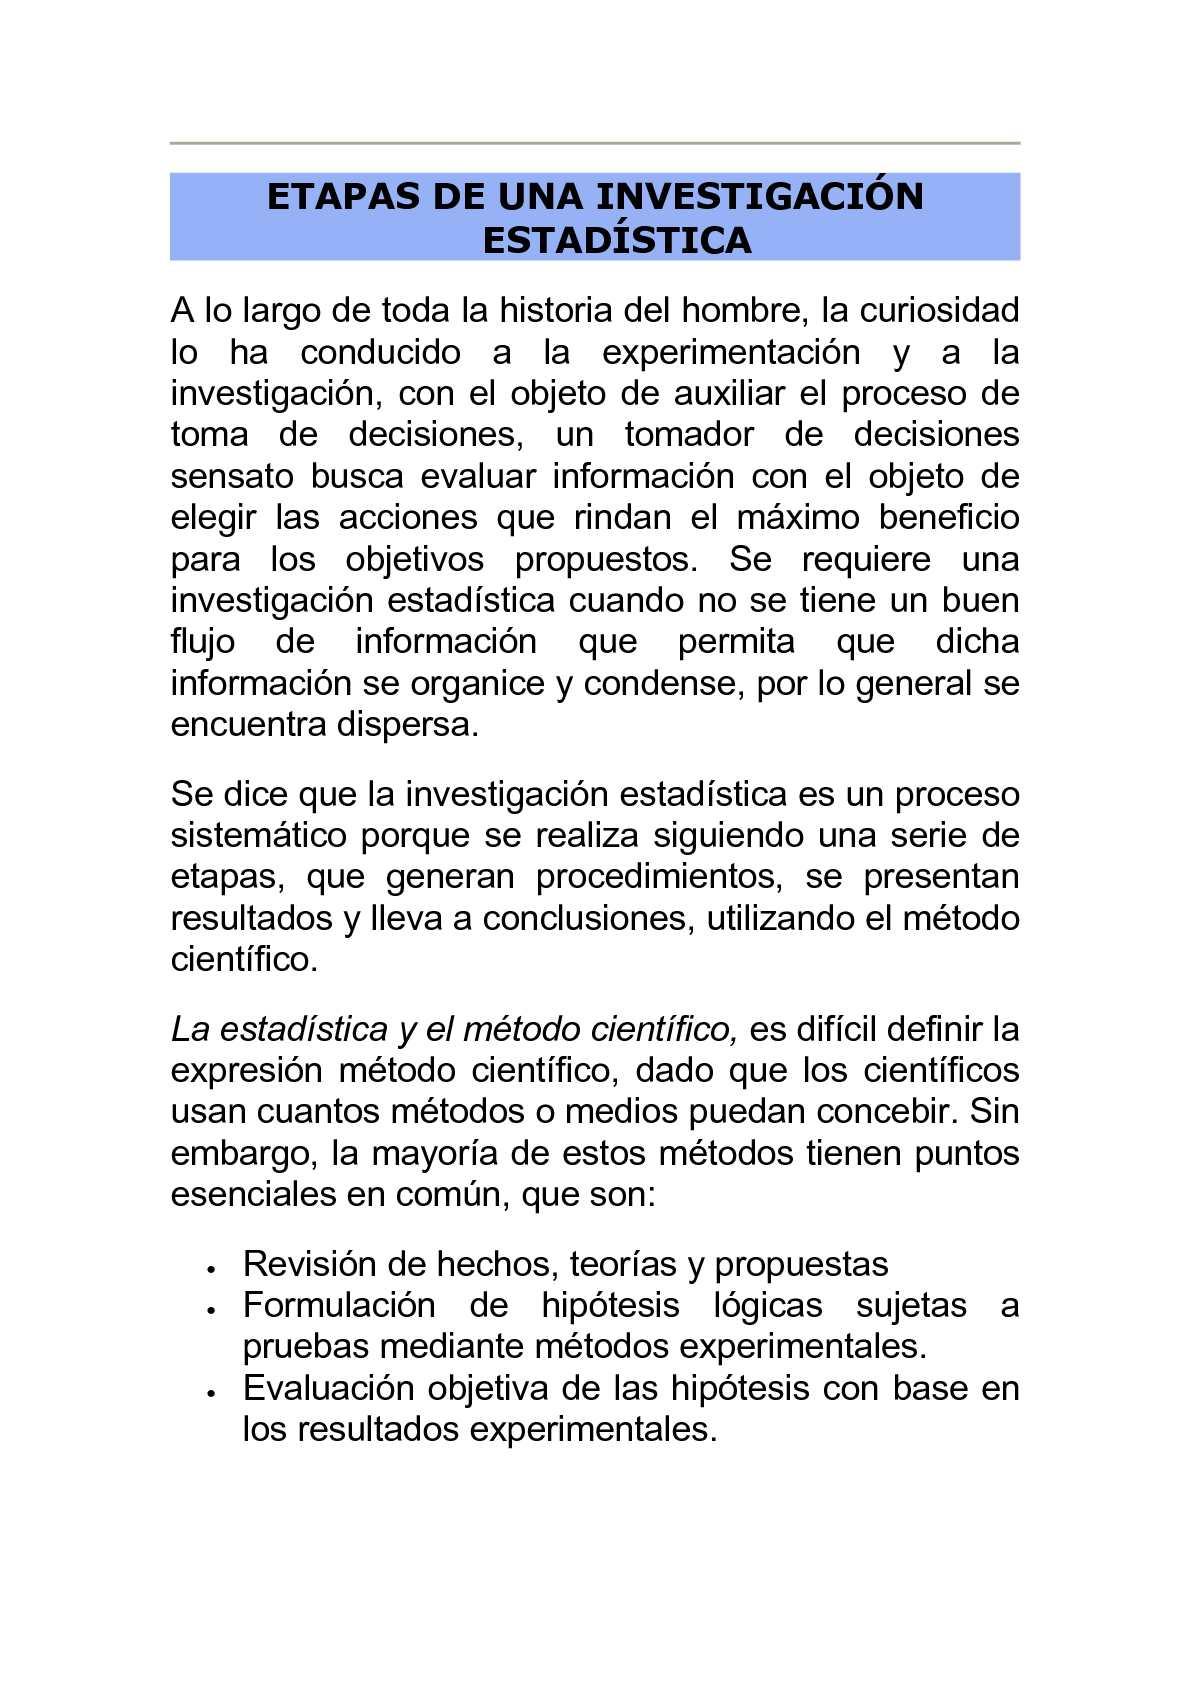 Calaméo - ETAPAS DE UNA INVESTIGACION ESTADISTICA